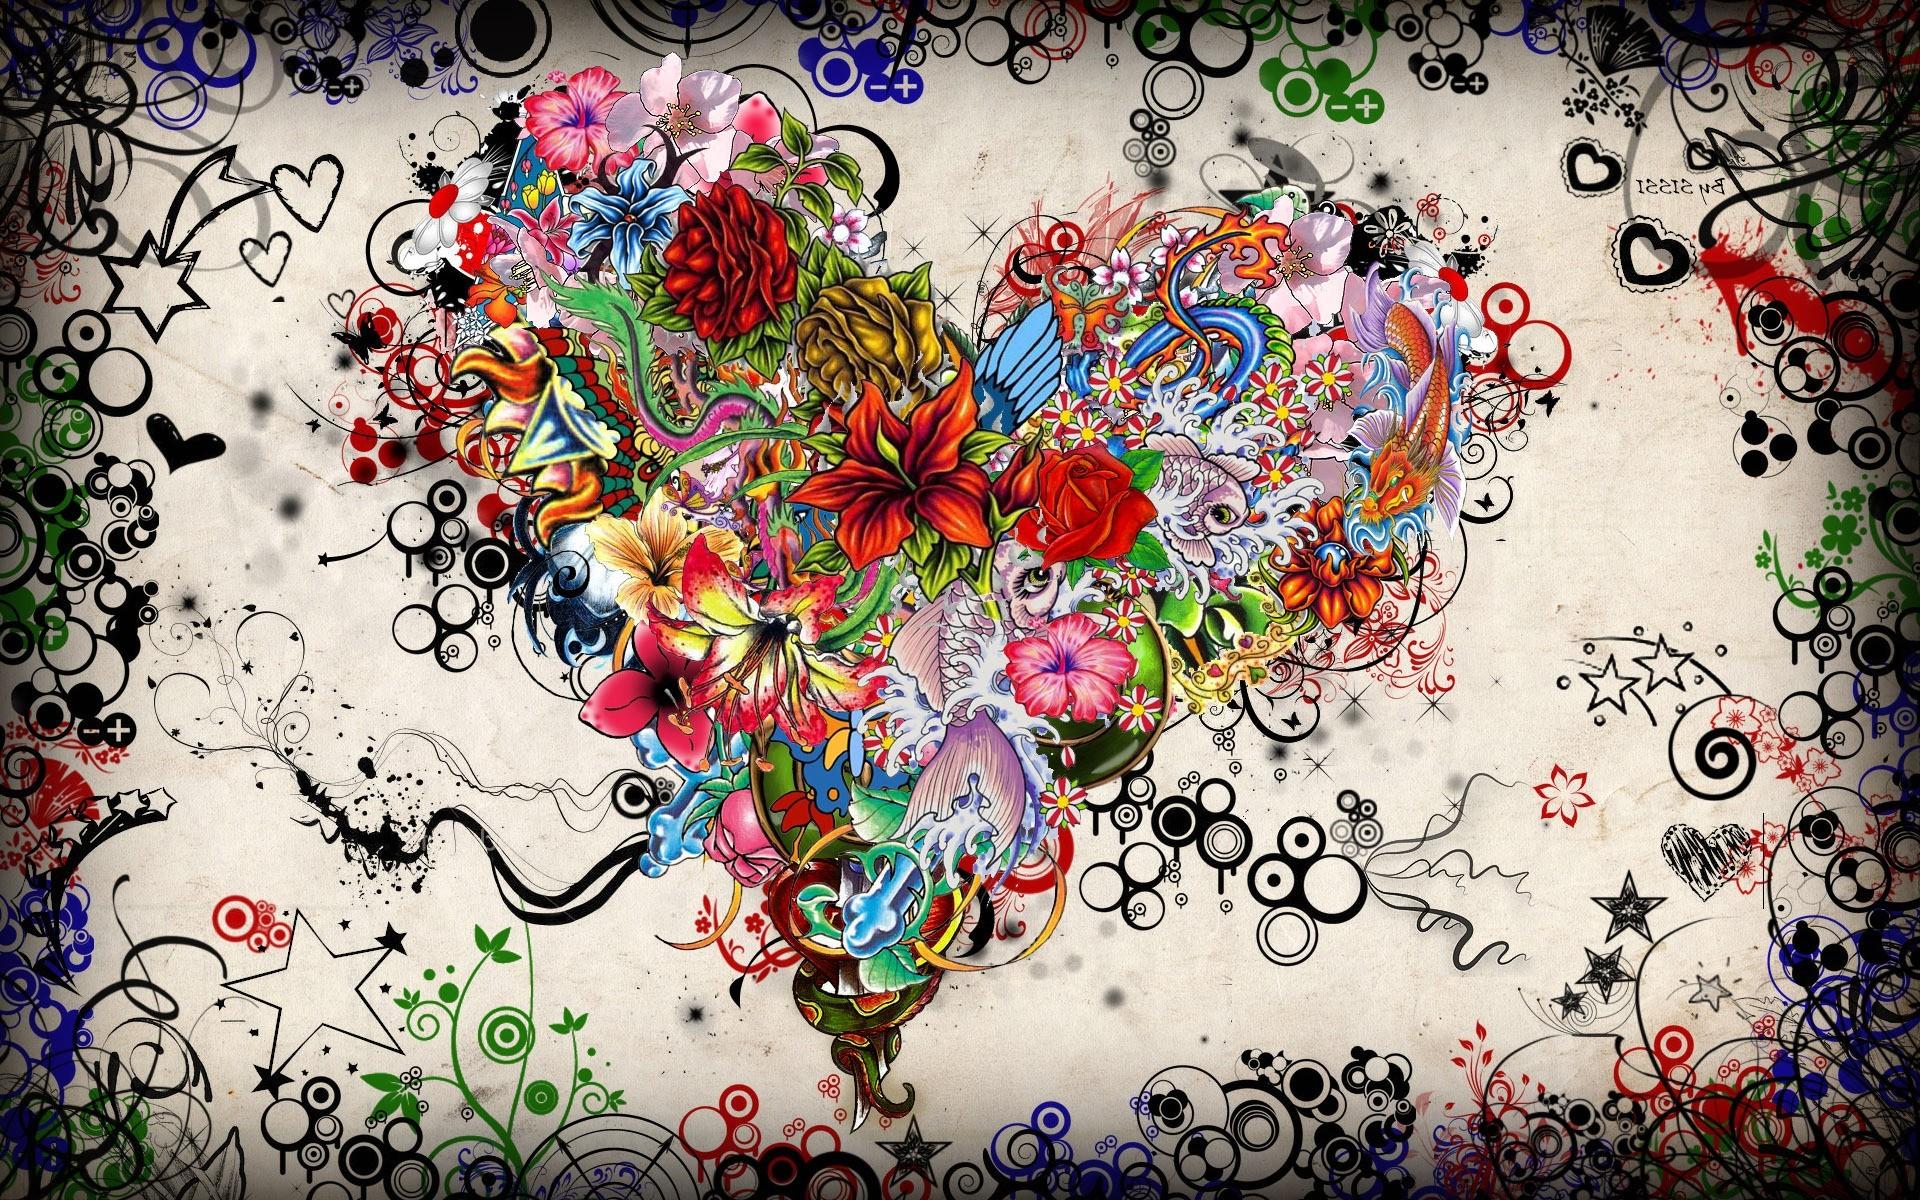 wallpaper : 1920x1200 px, artwork, circle, colorful, fish, flowers